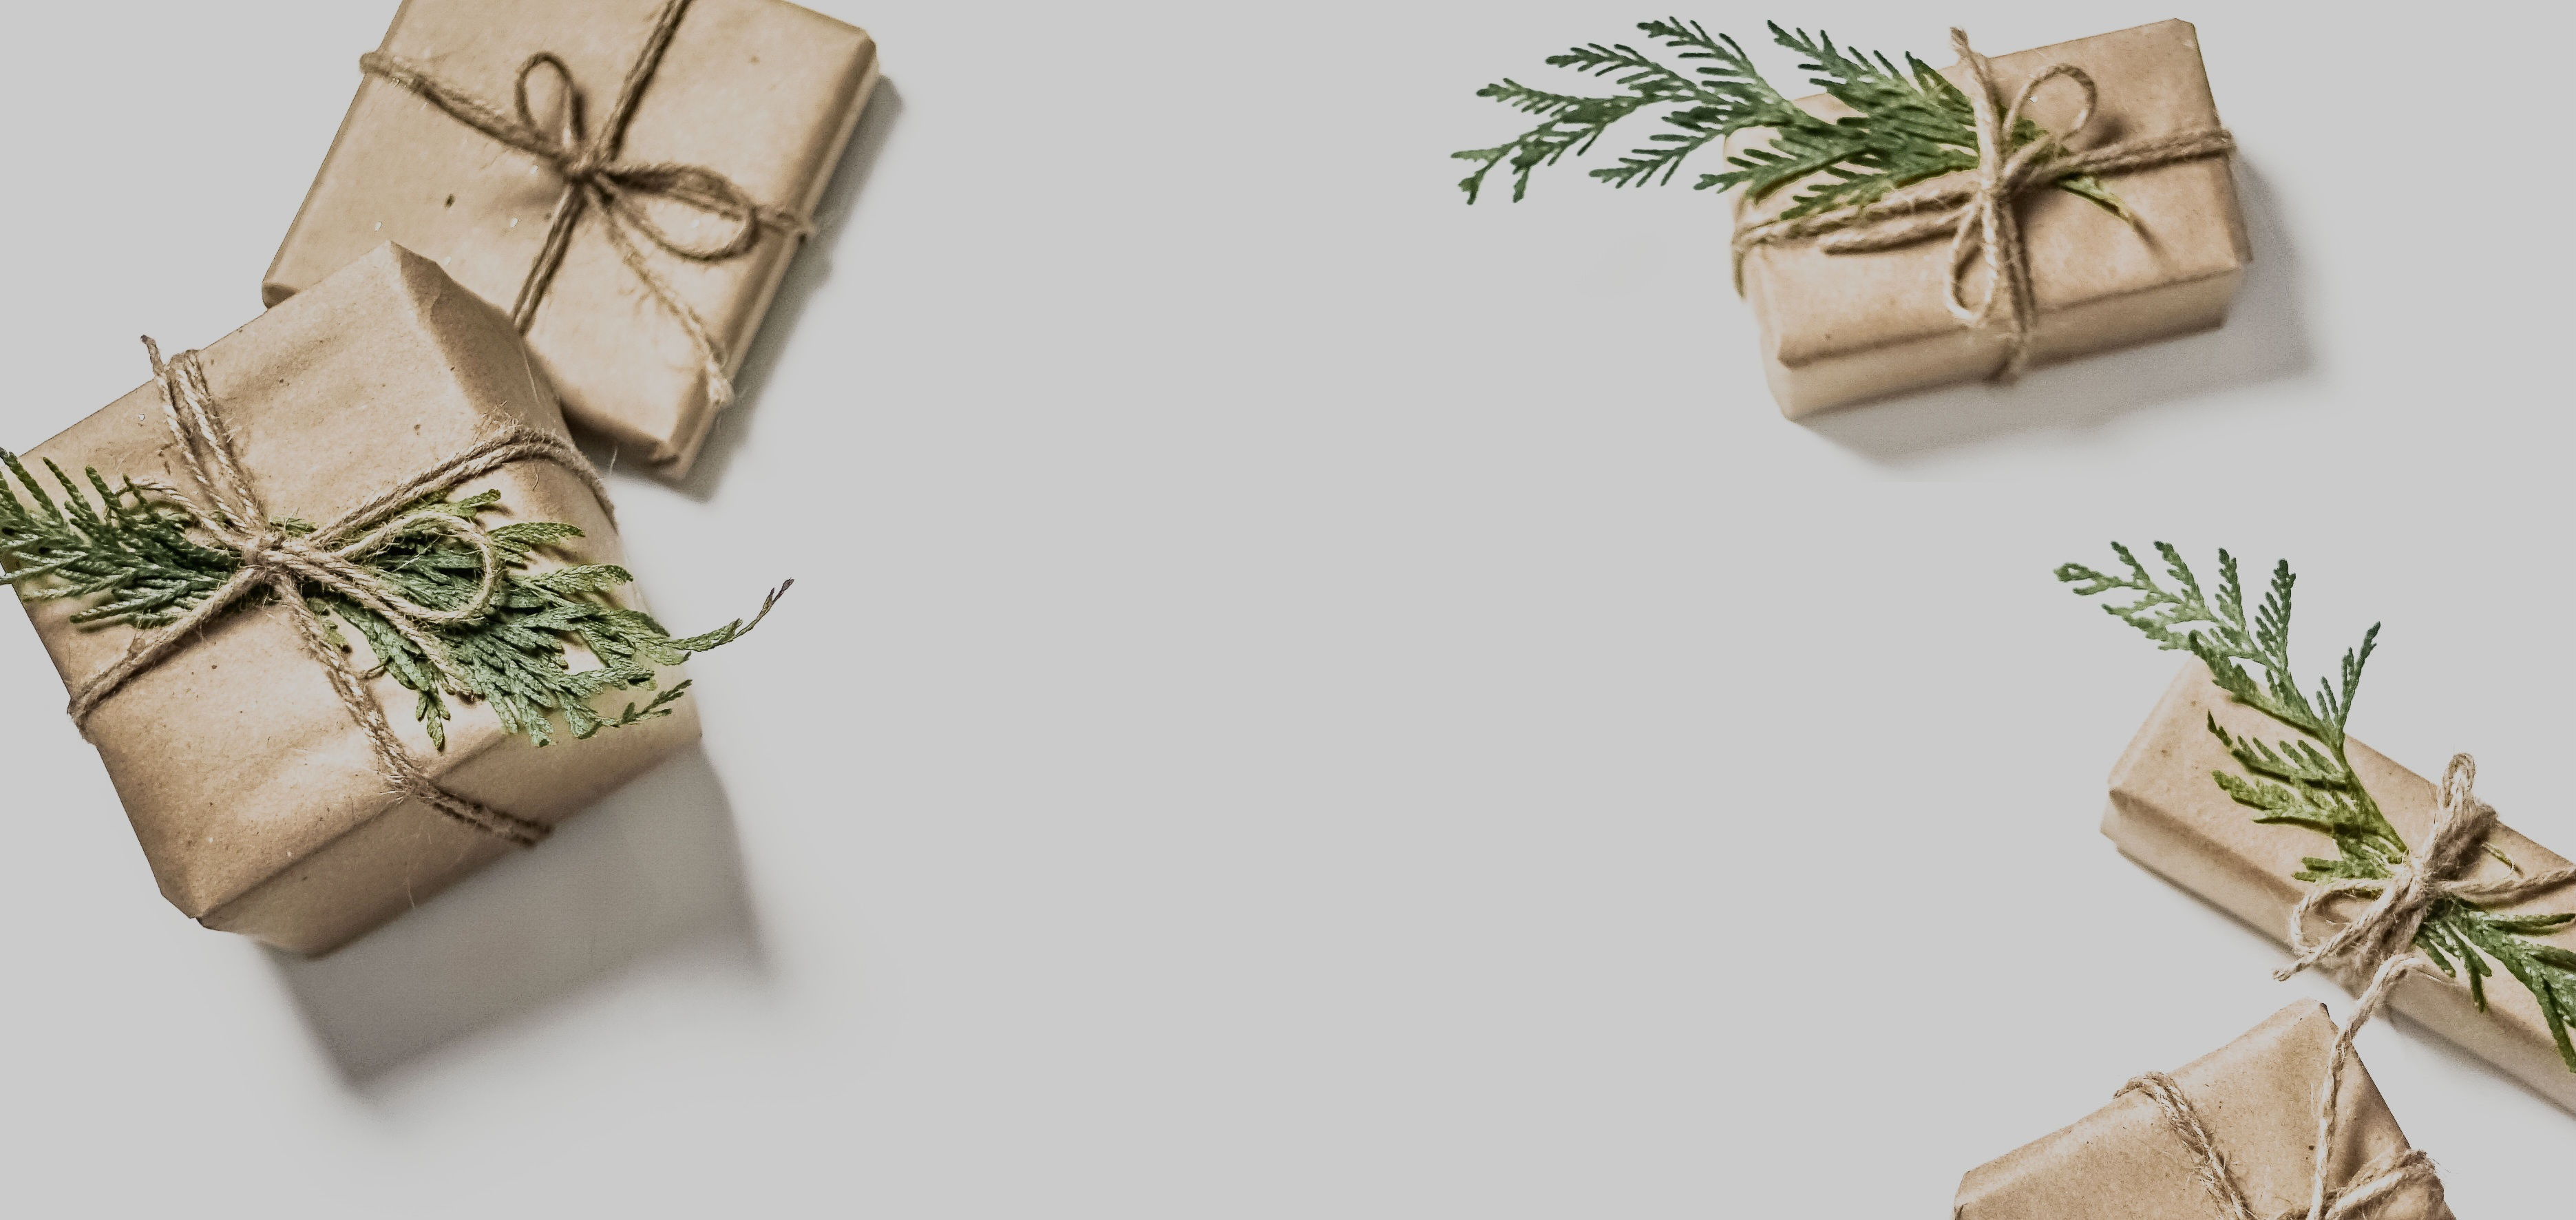 Bookeo unwraps 3 new gift voucher features